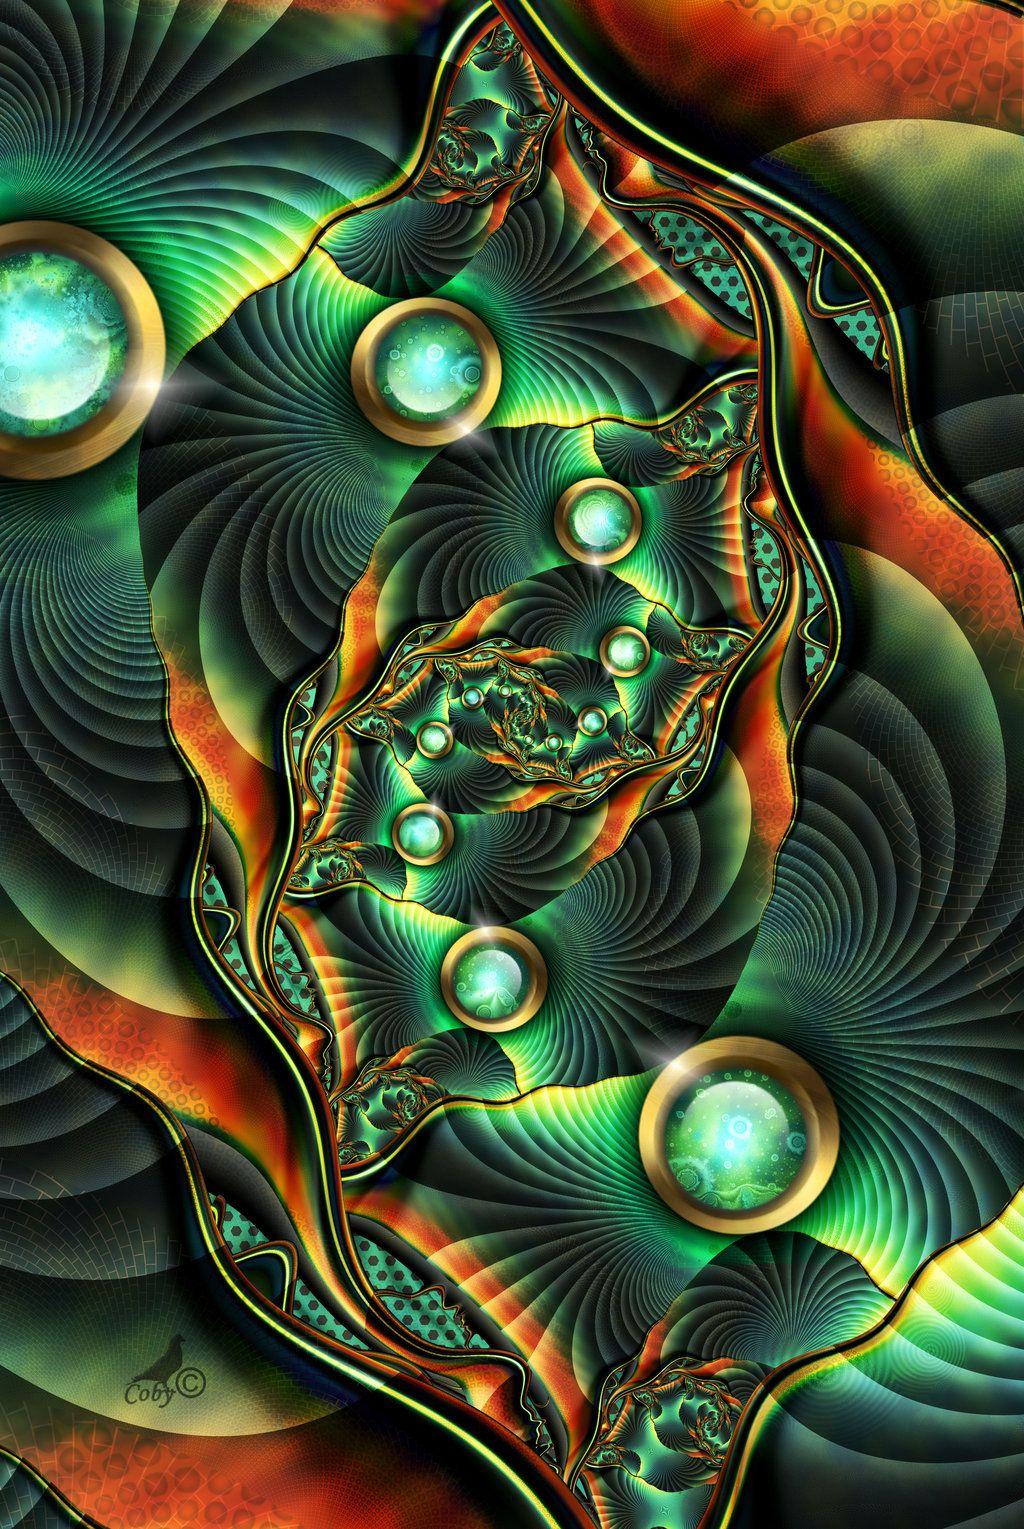 Parrotvalley Coby01 Deviantart Fractal Art